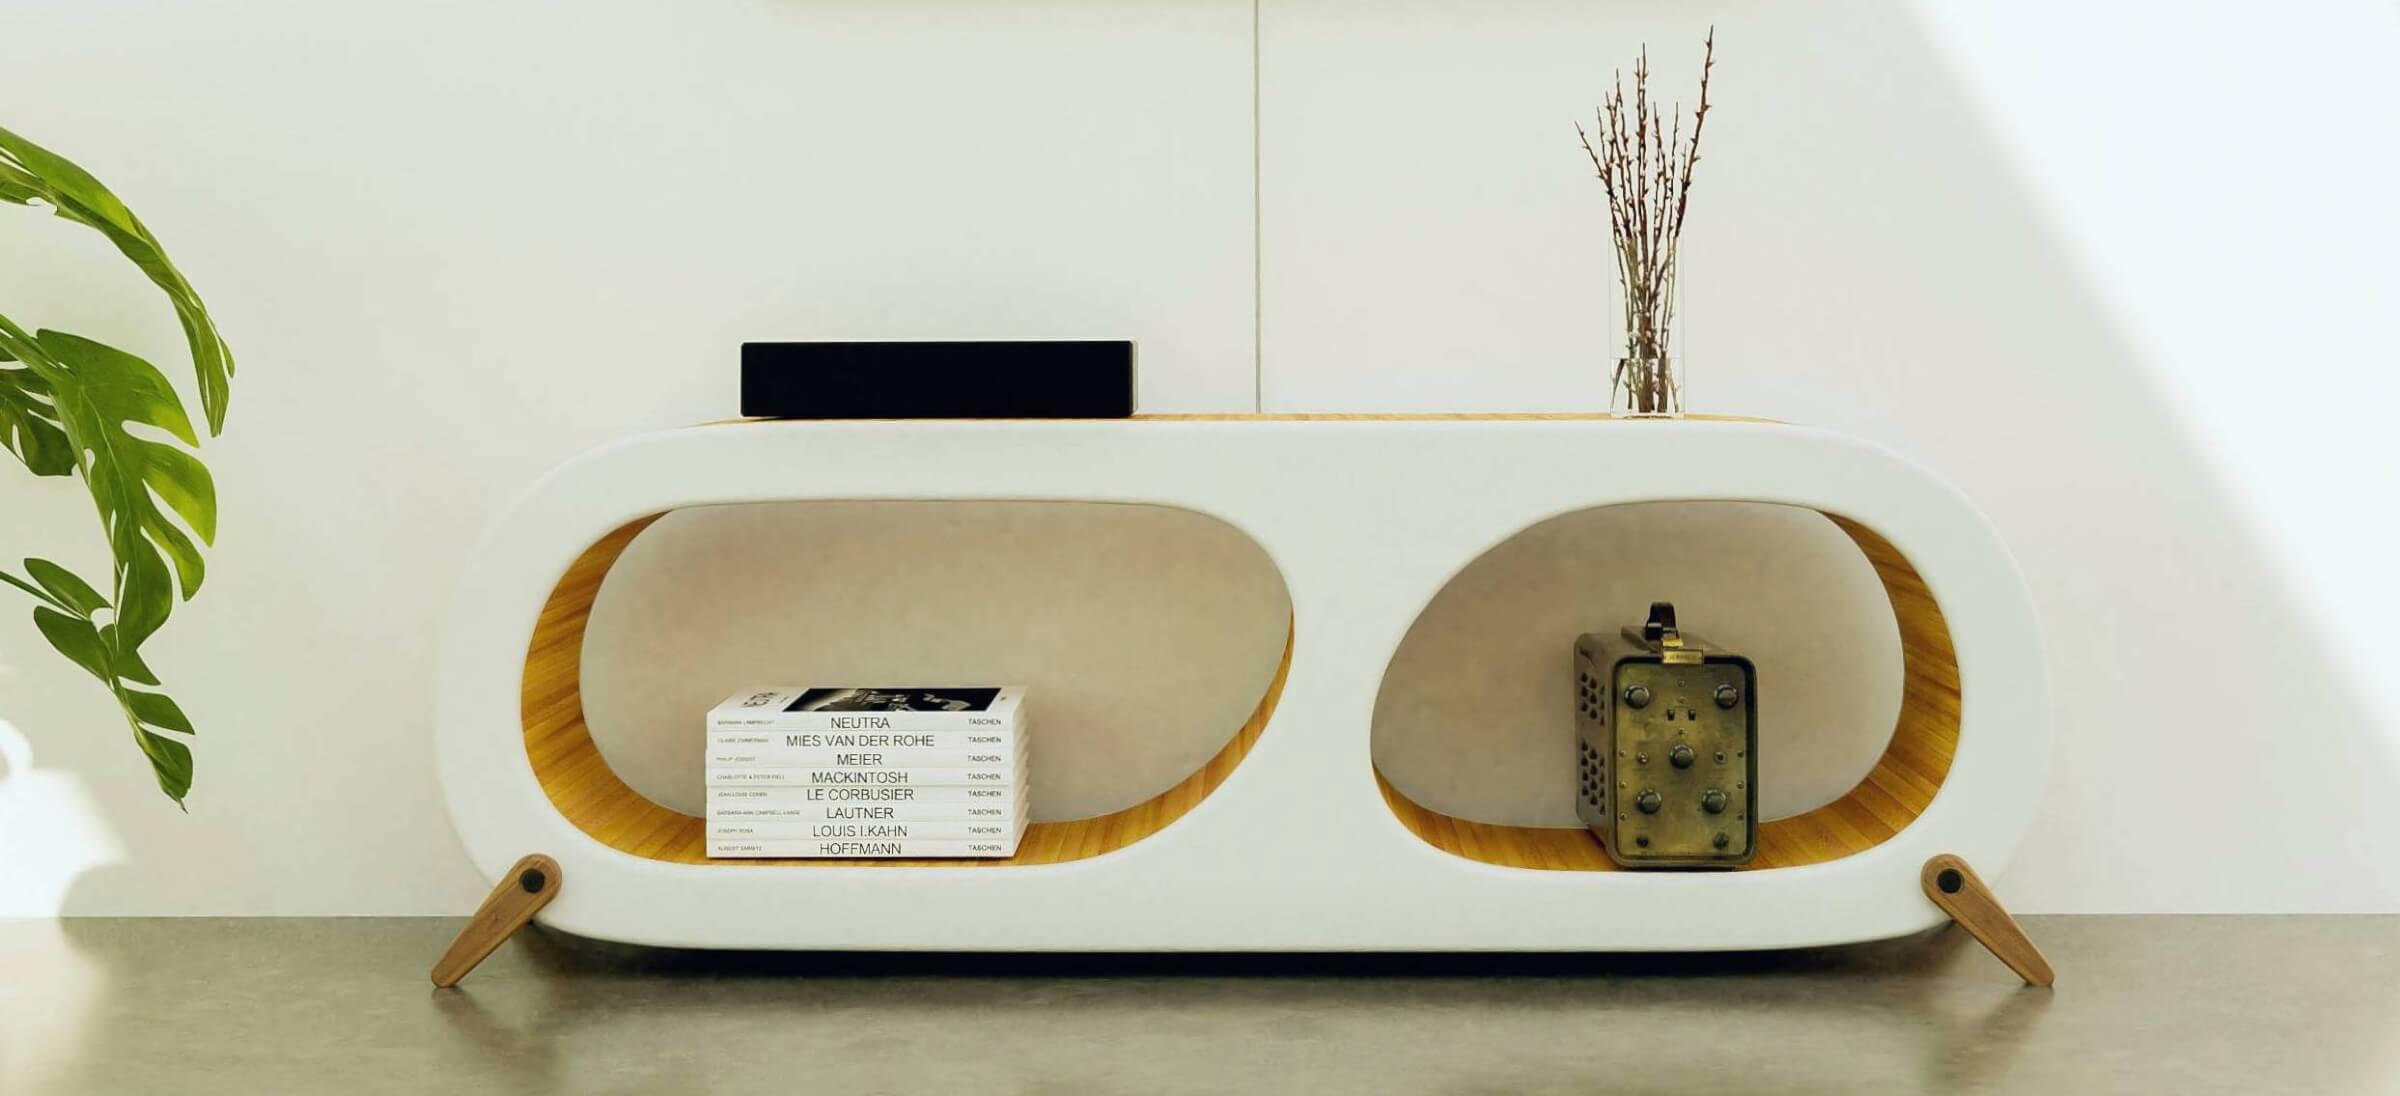 Design tv meubel in woonkamer